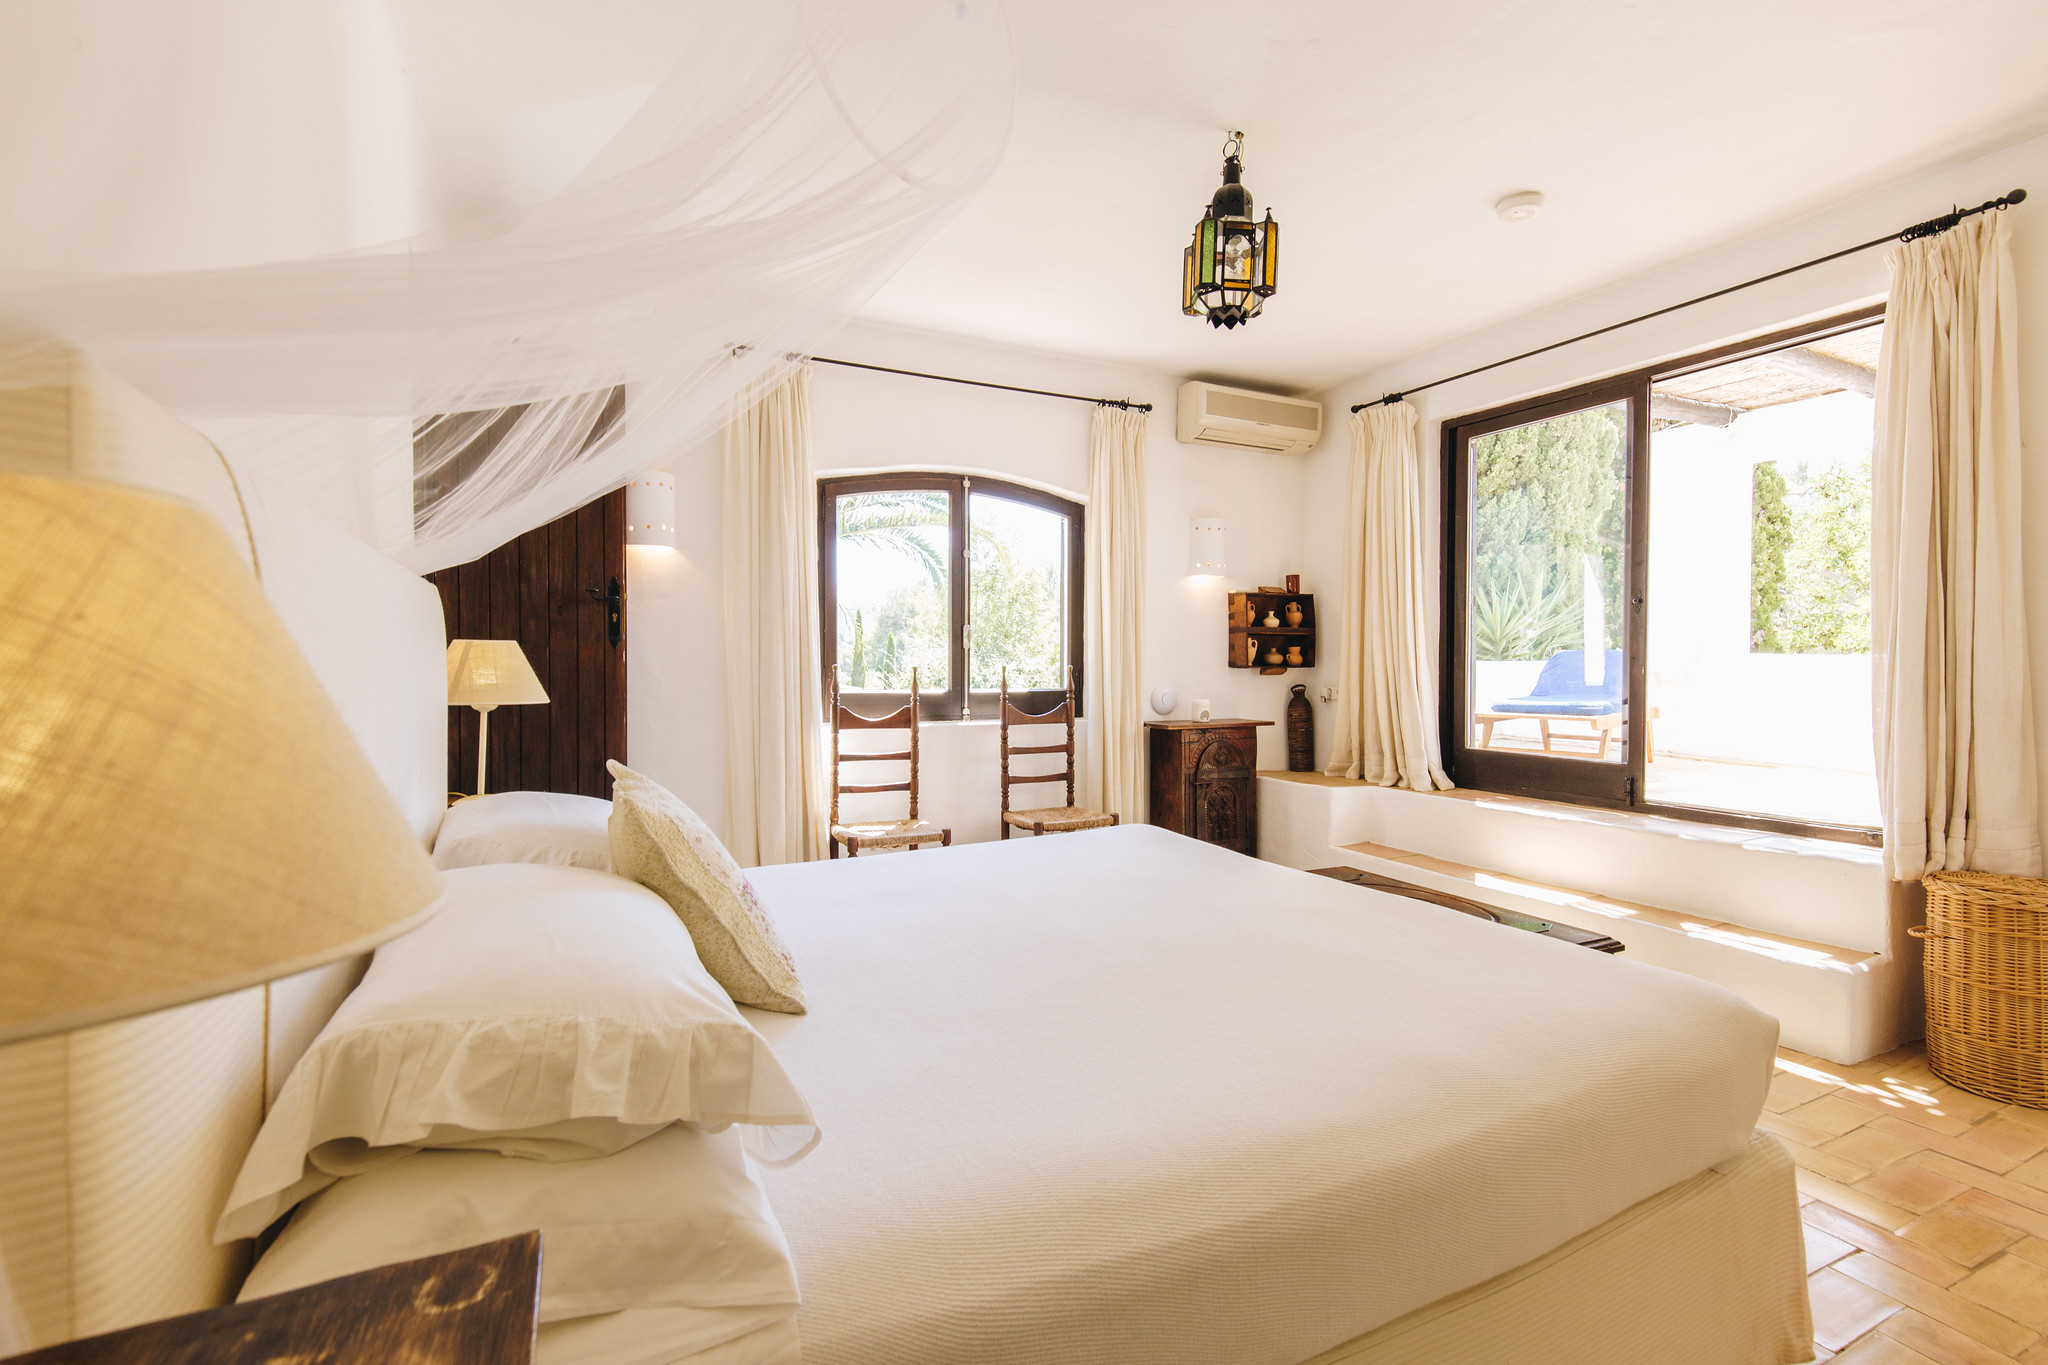 https://www.white-ibiza.com/wp-content/uploads/2020/05/white-ibiza-villas-can-amelida-interior-bedroom2.jpg